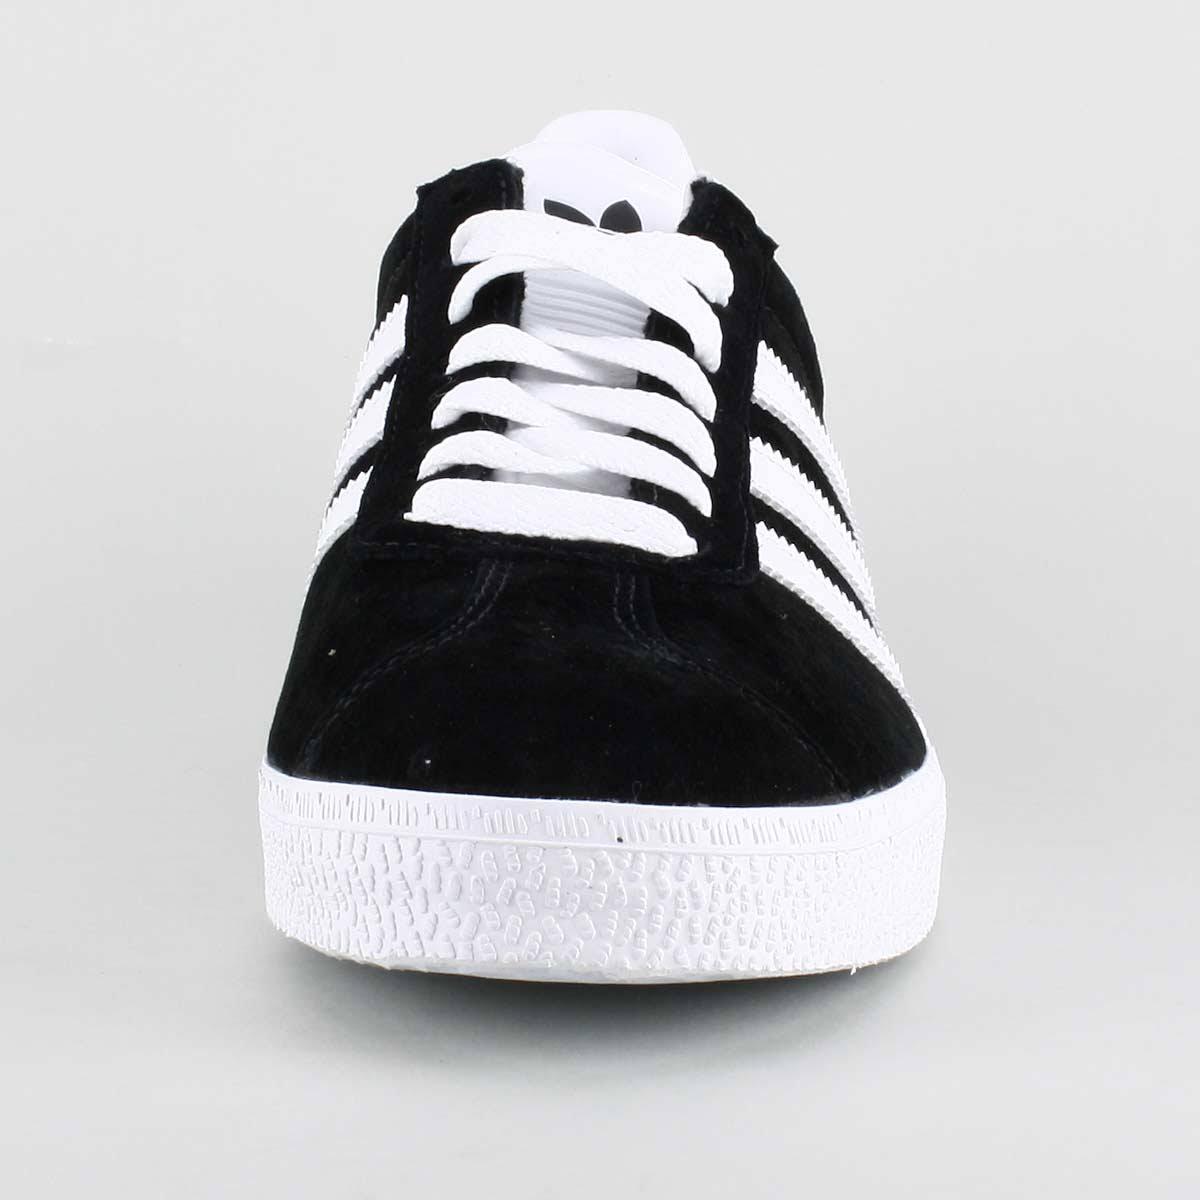 Rare Gazelle White Tamaño Black 5 Classic Us 2007 Originals Adidas 11 wTUqYY